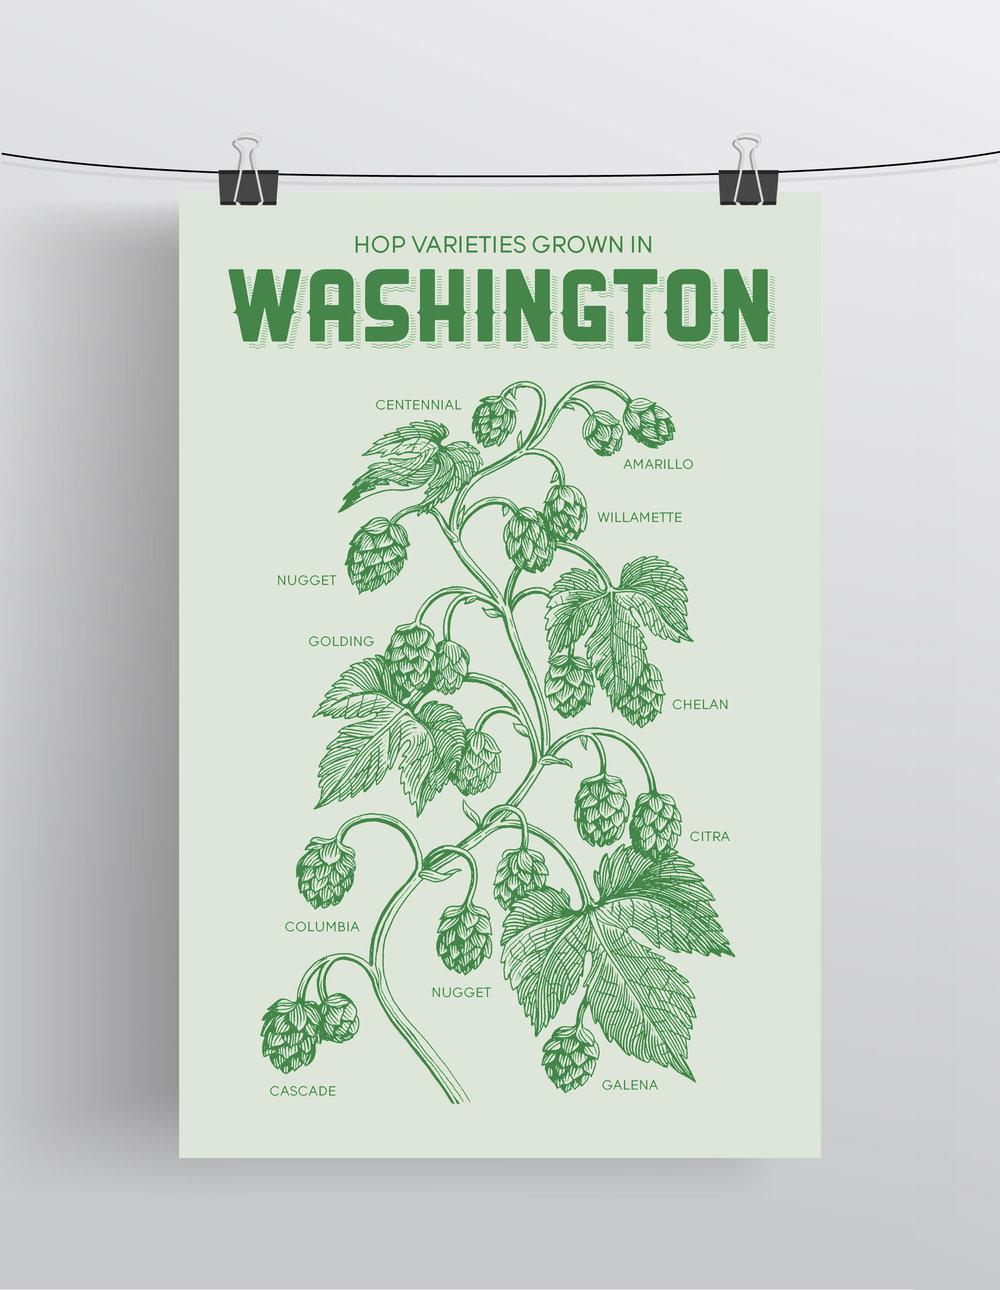 Washington Hop Varieties  Screenprint